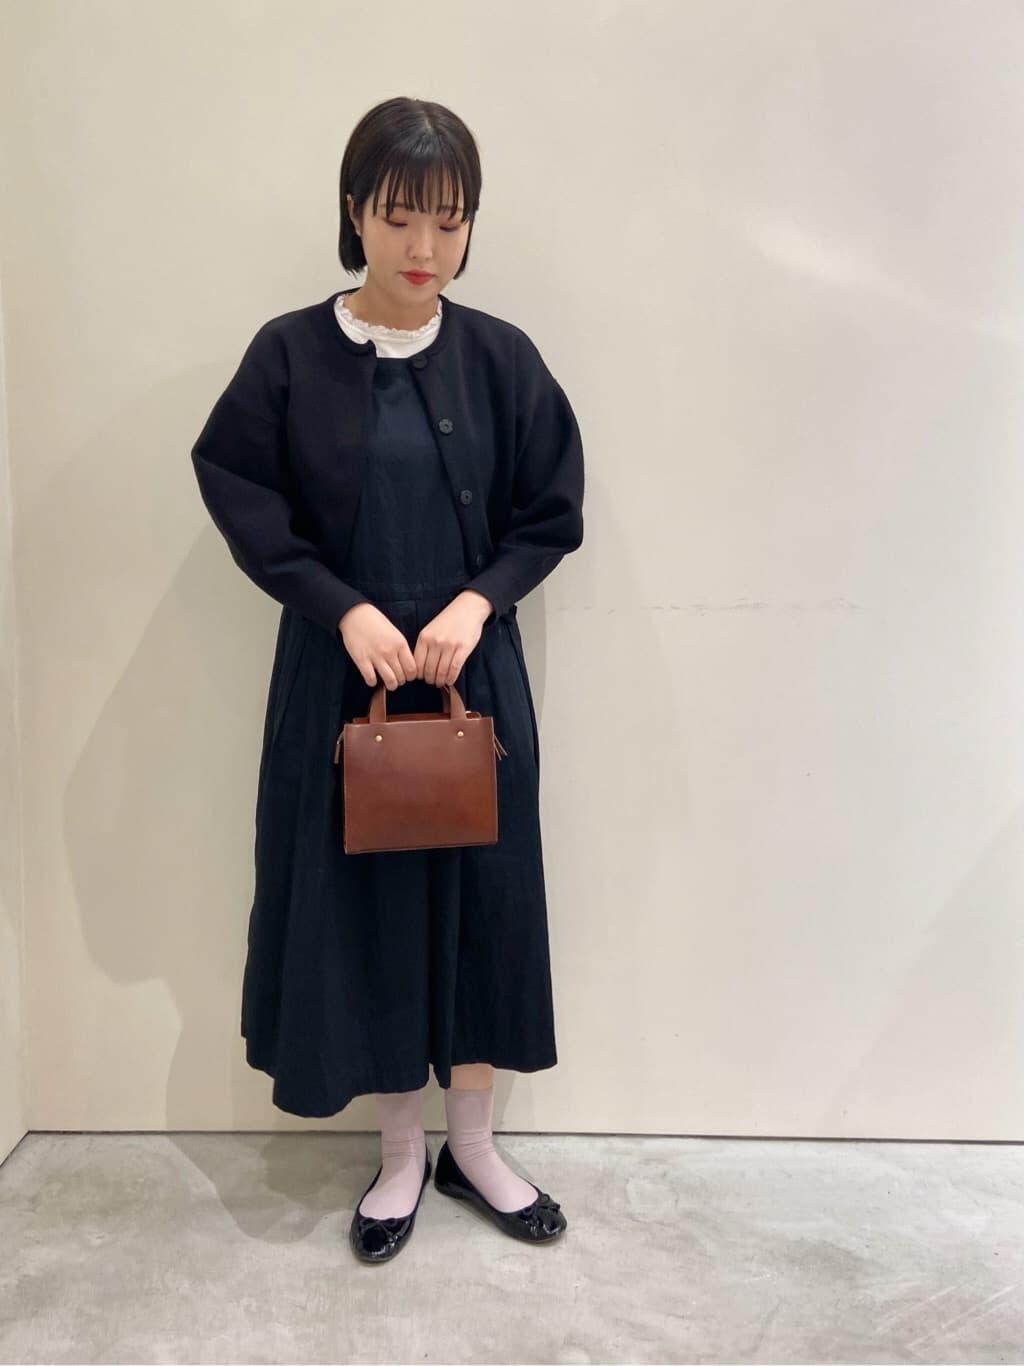 Dot and Stripes CHILD WOMAN CHILD WOMAN , PAR ICI 新宿ミロード 身長:160cm 2021.10.11